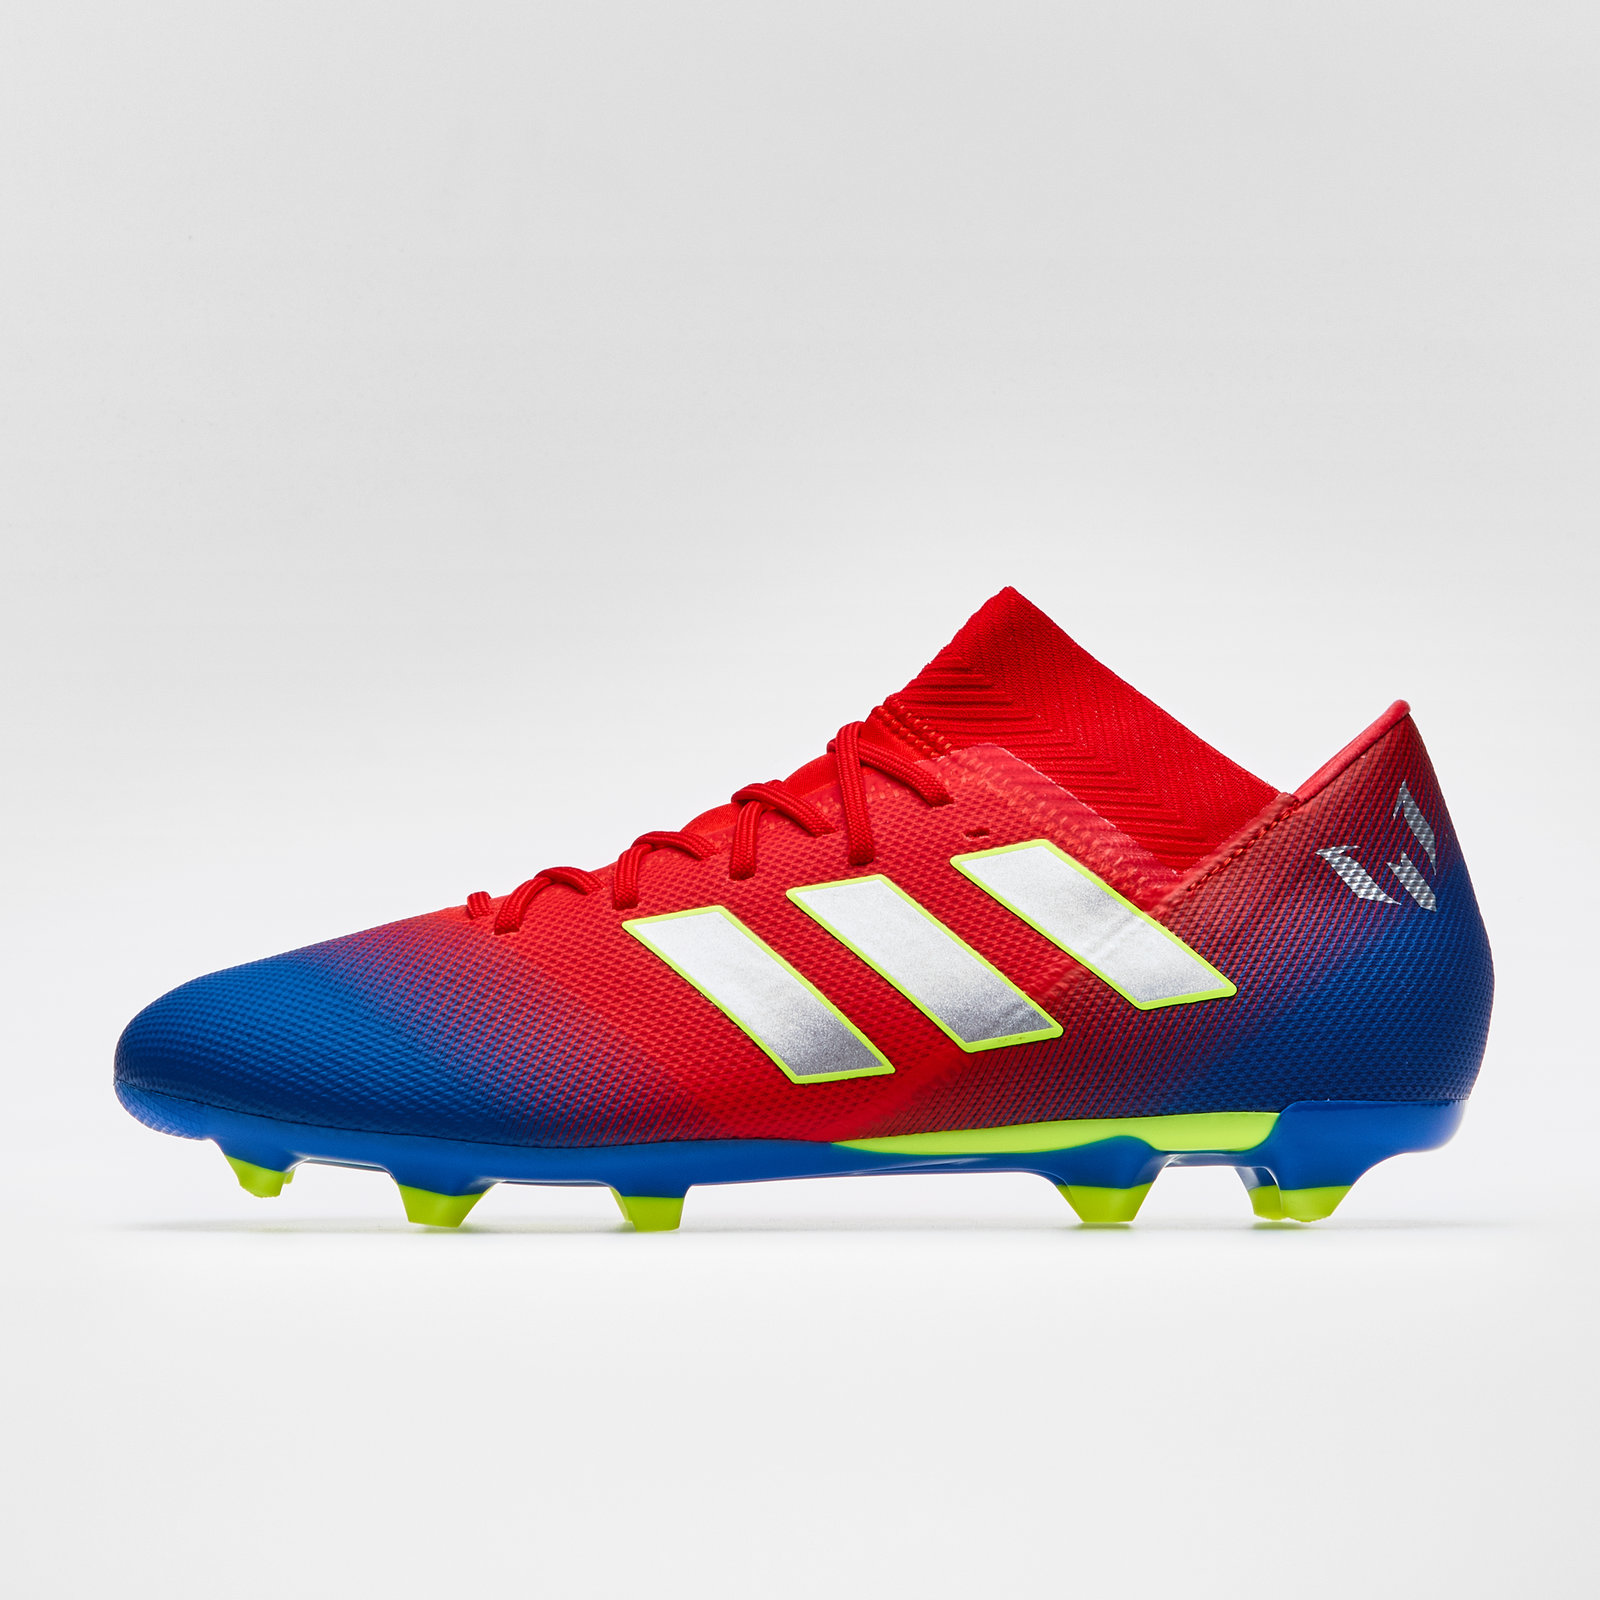 78c0c7f54 adidas Mens Nemeziz Messi 18.3 FG Football Boots Studs Trainers Sports Shoes  Red